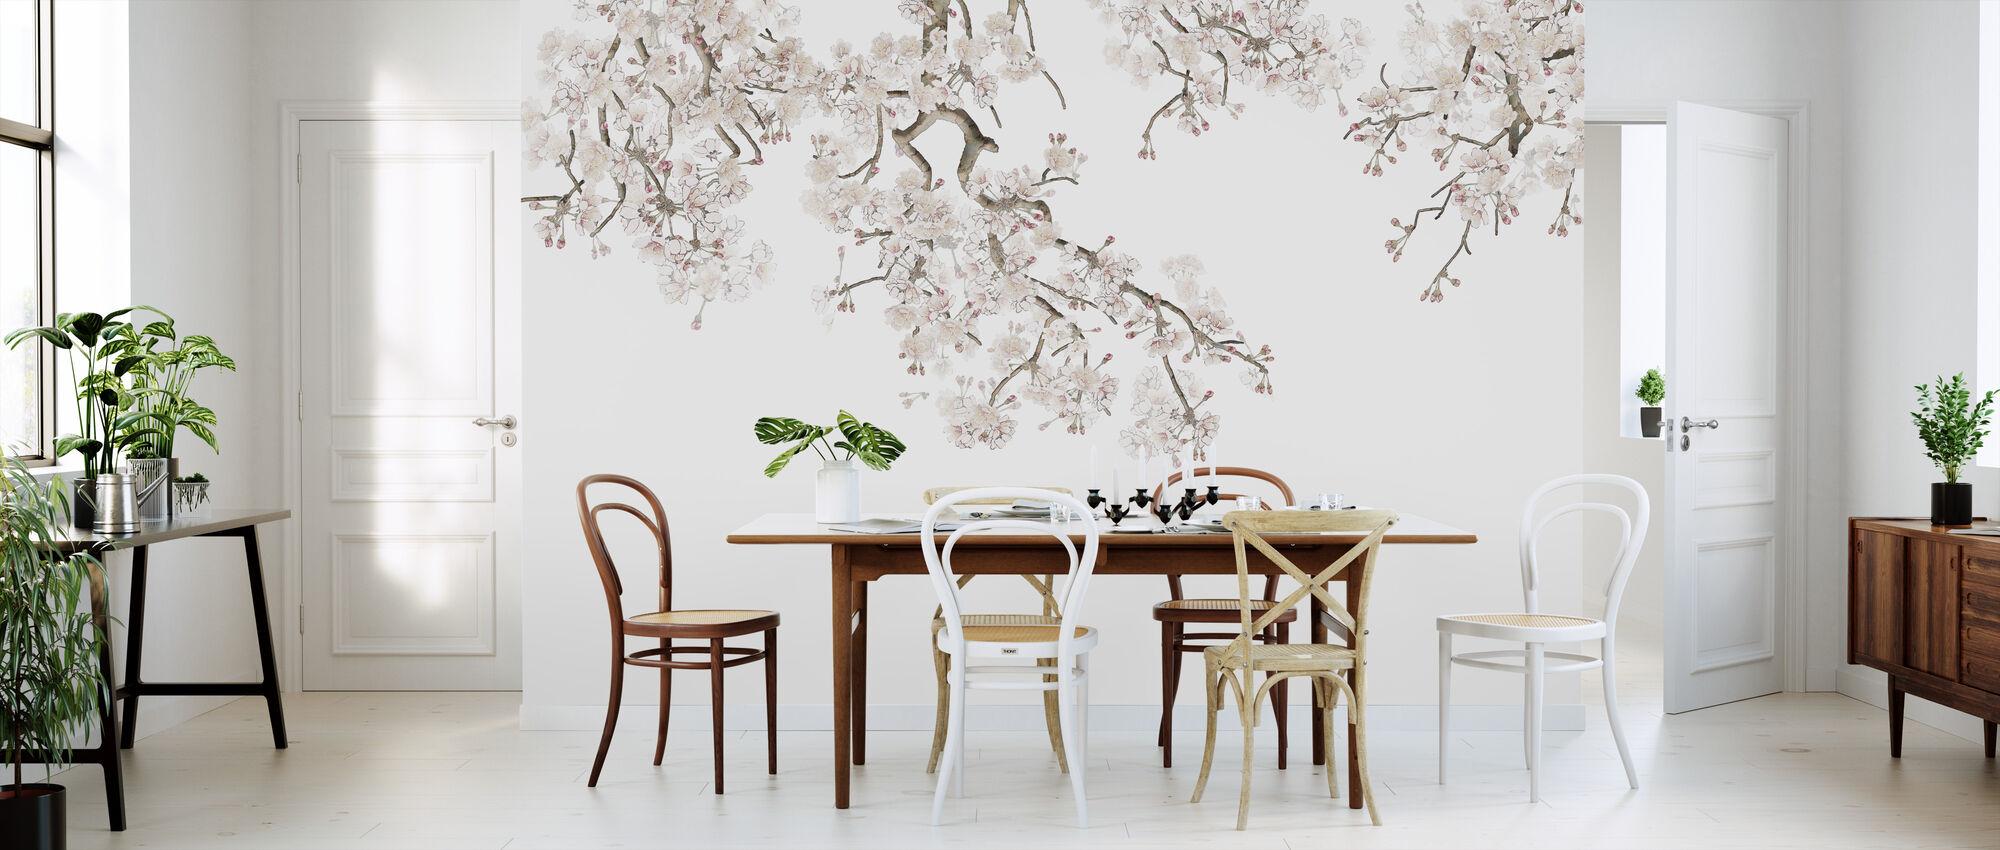 Hanging Branches - Wallpaper - Kitchen